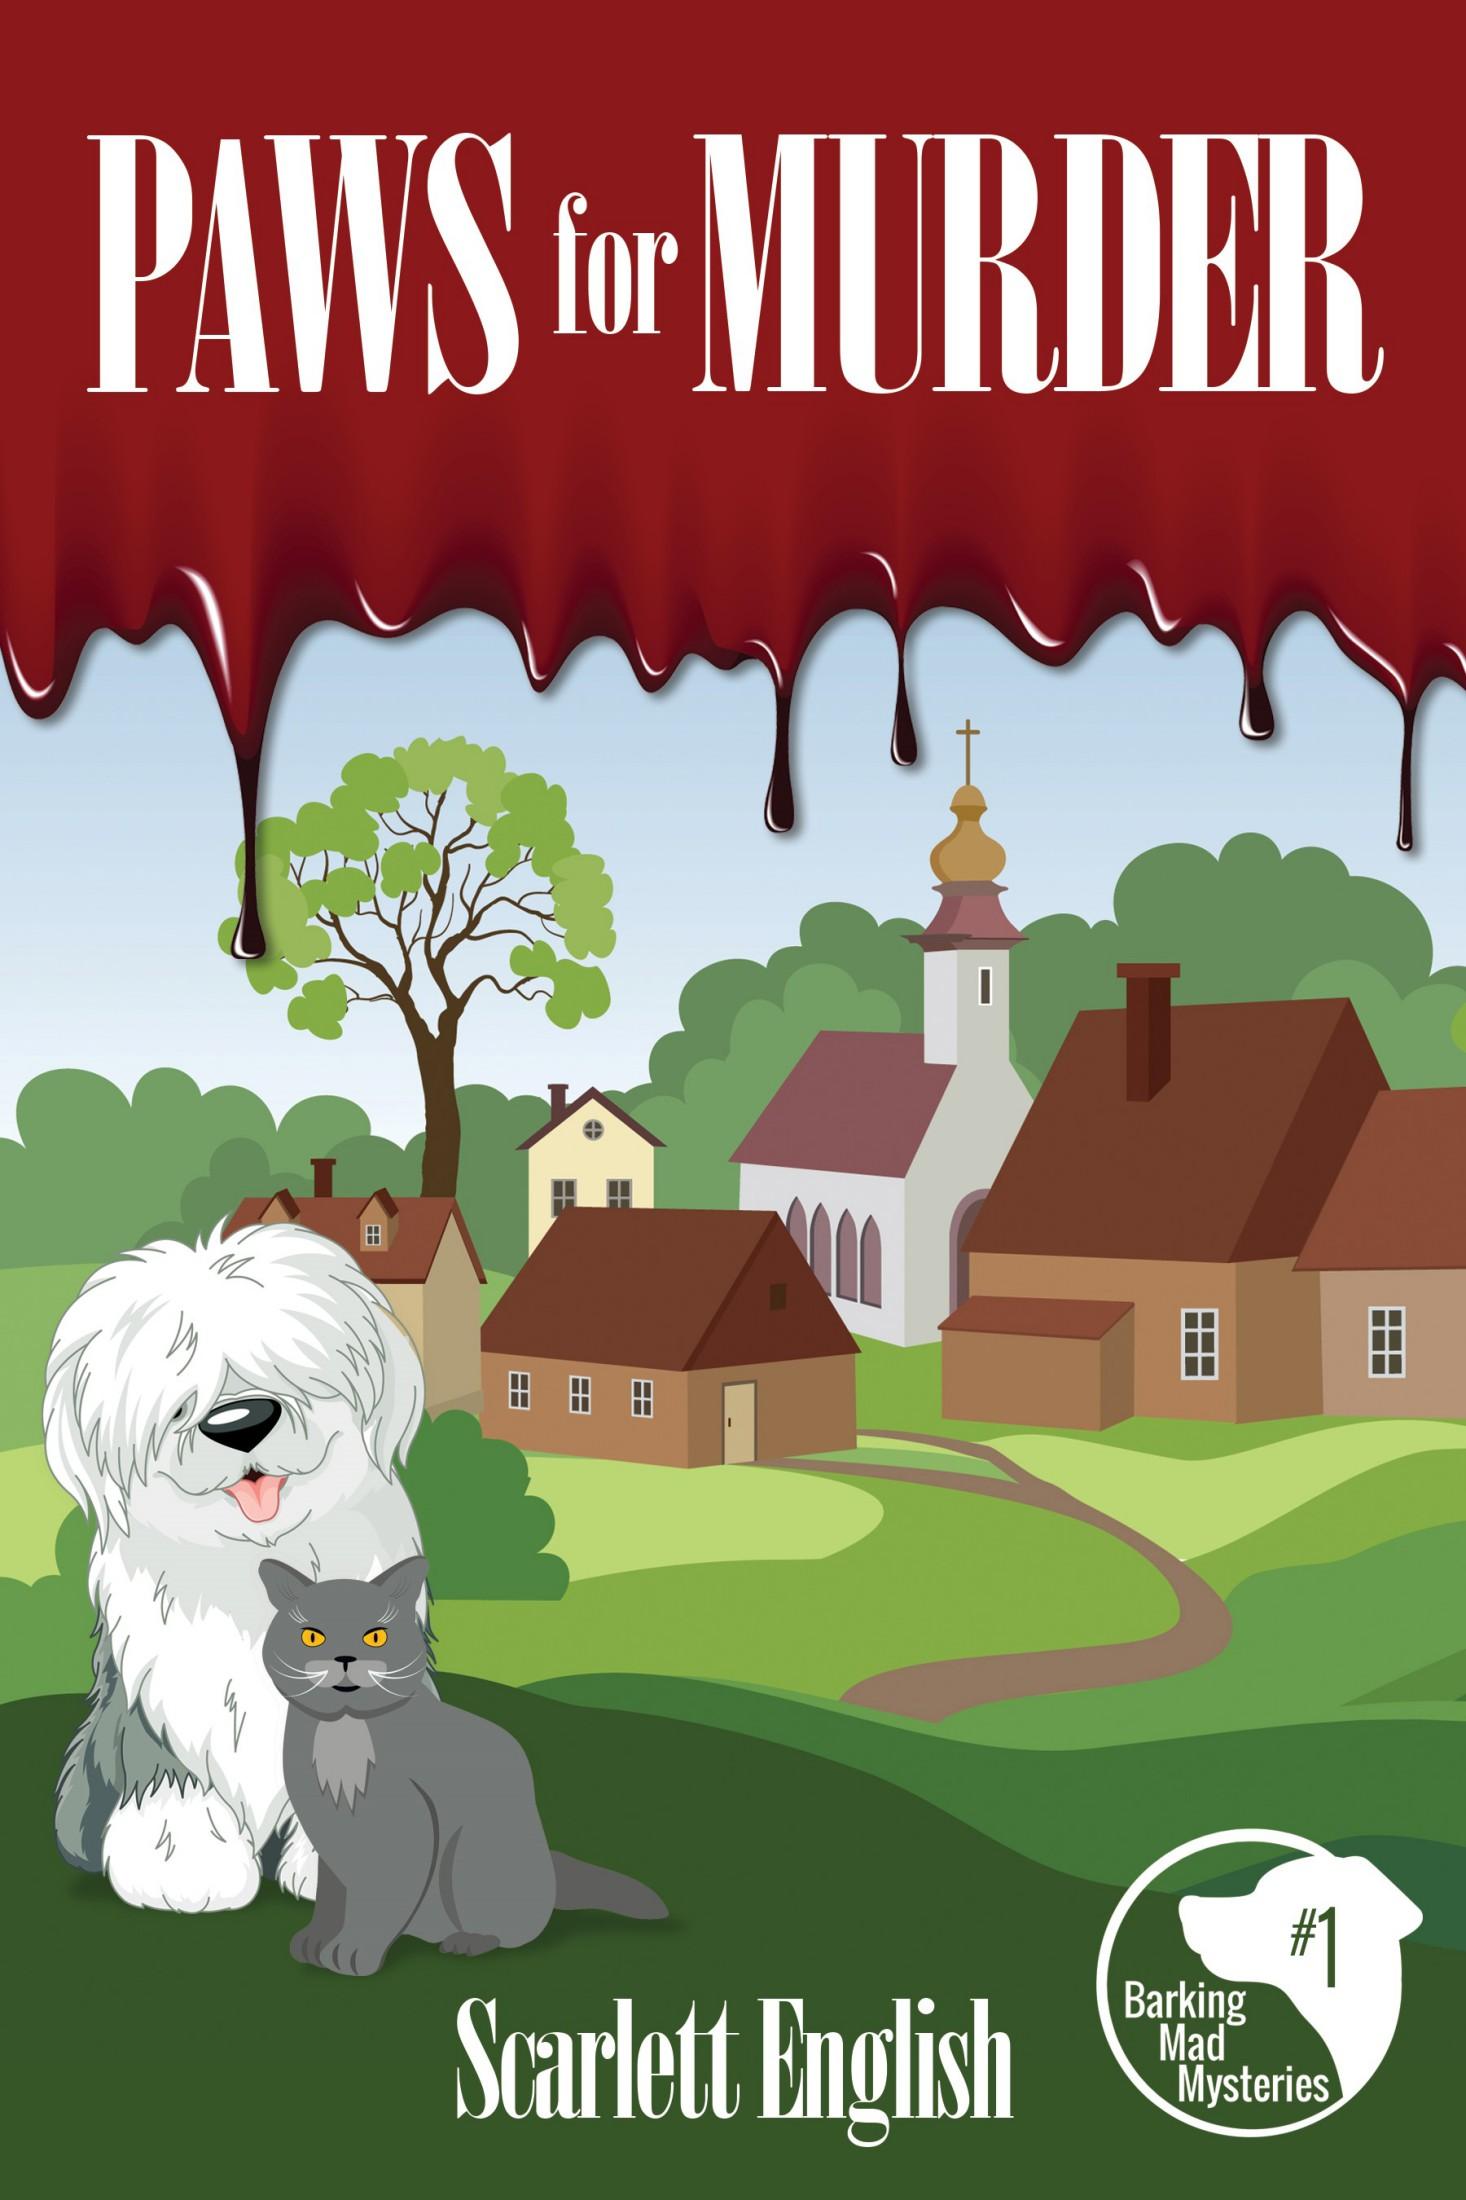 PawsForMurder - Scarlett English